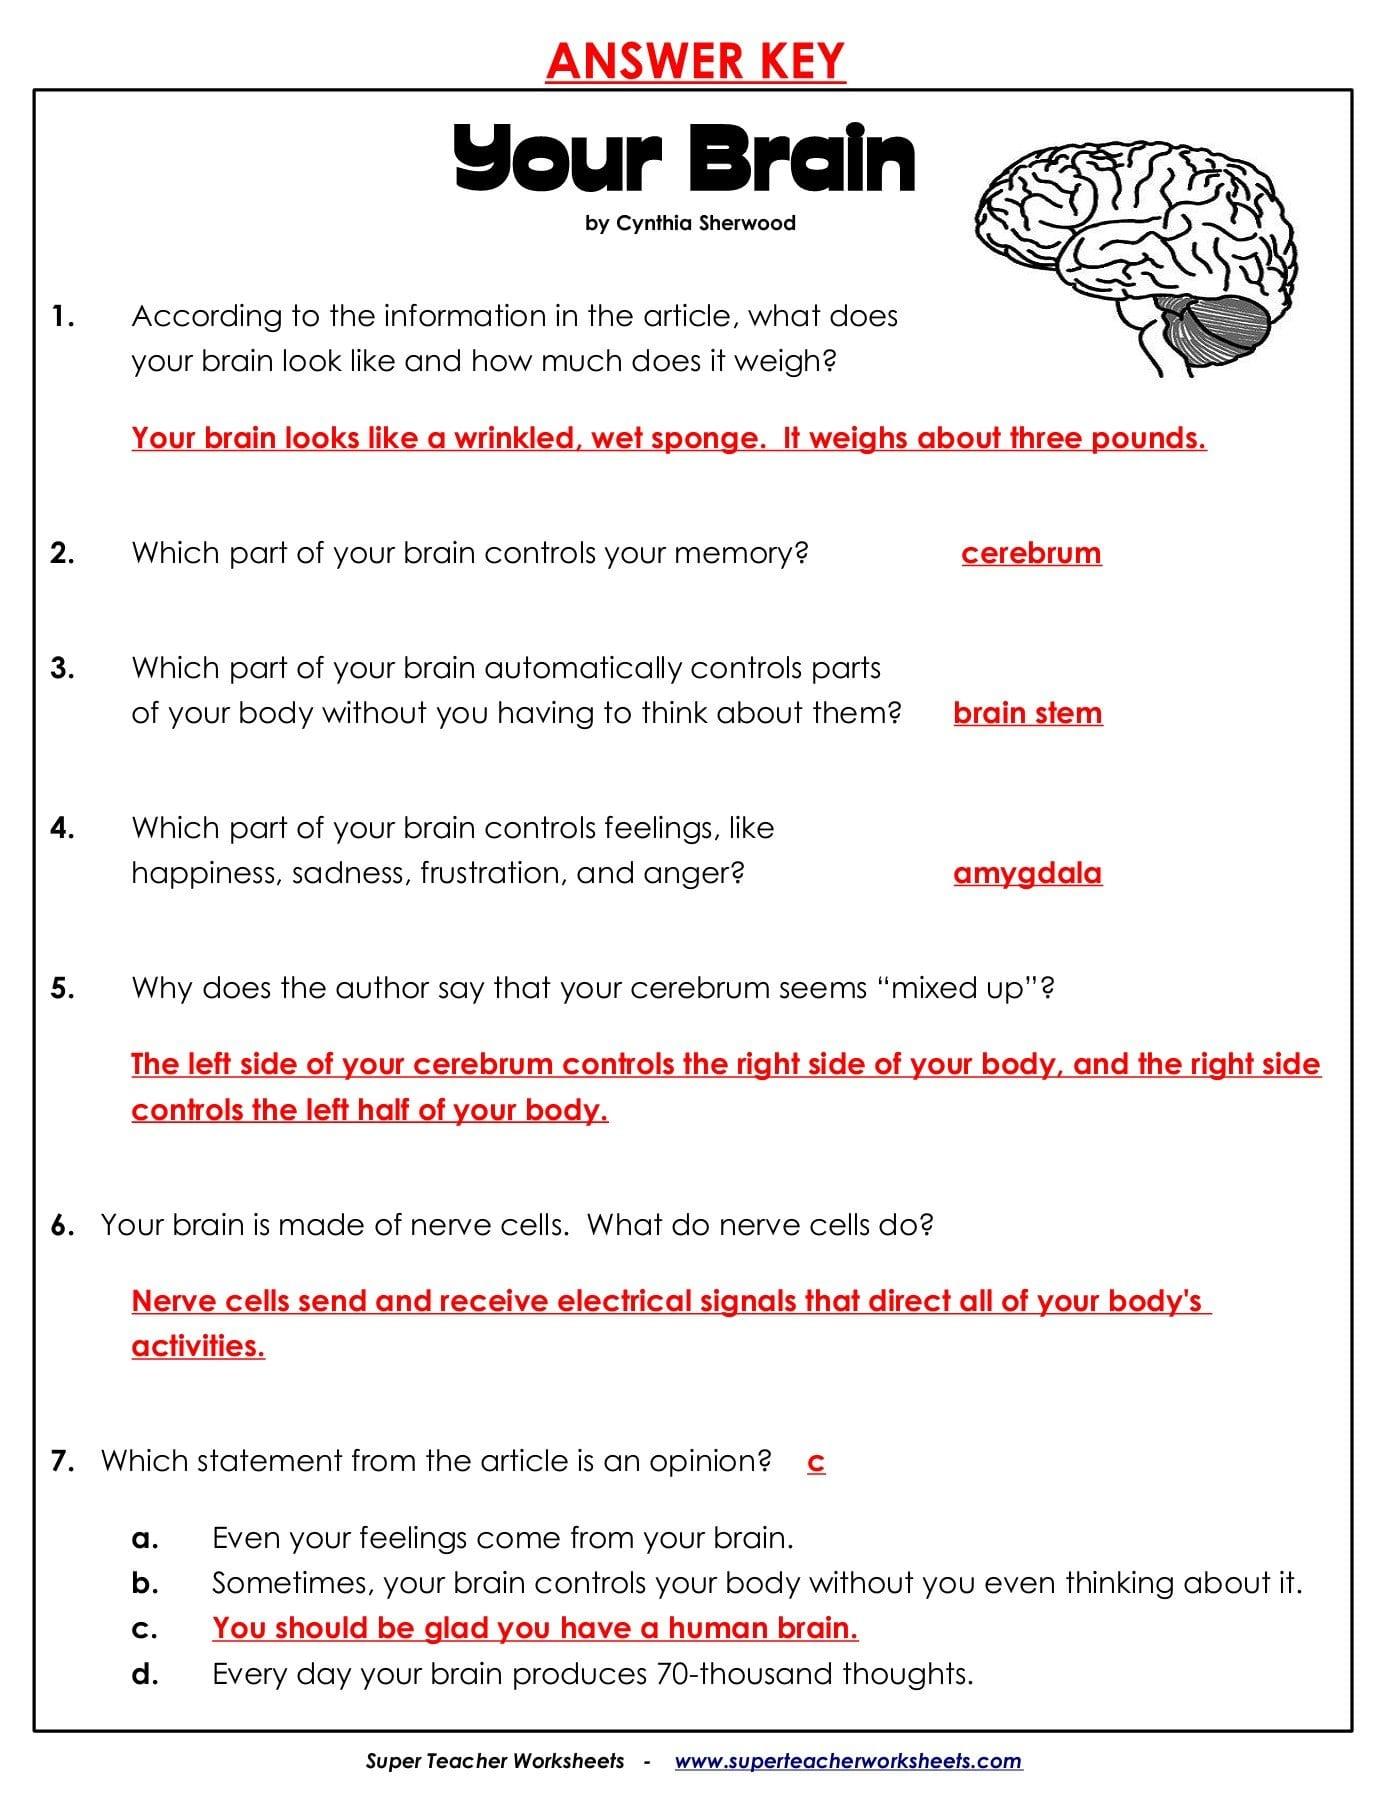 Super Teacher Worksheets Com